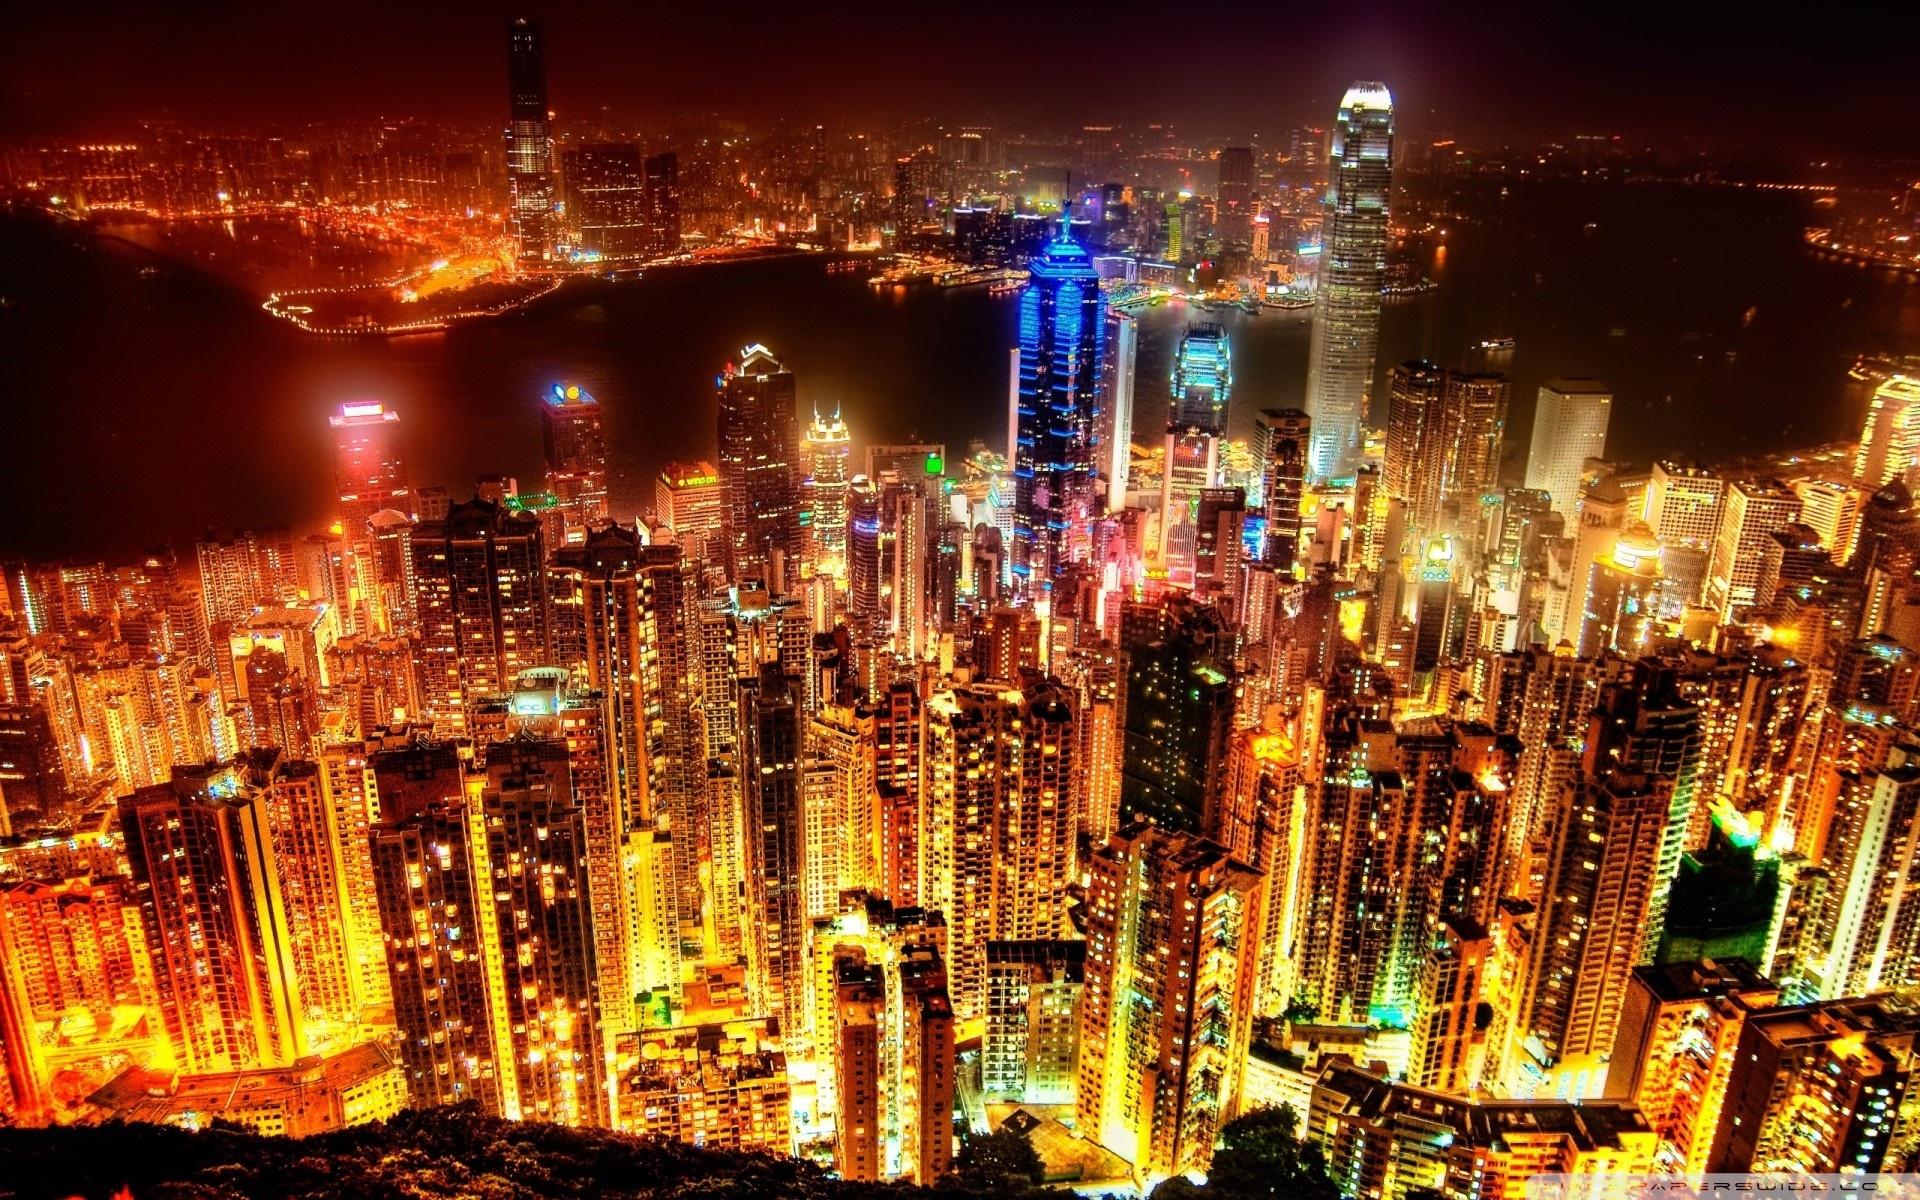 HD City Lights Wallpaper